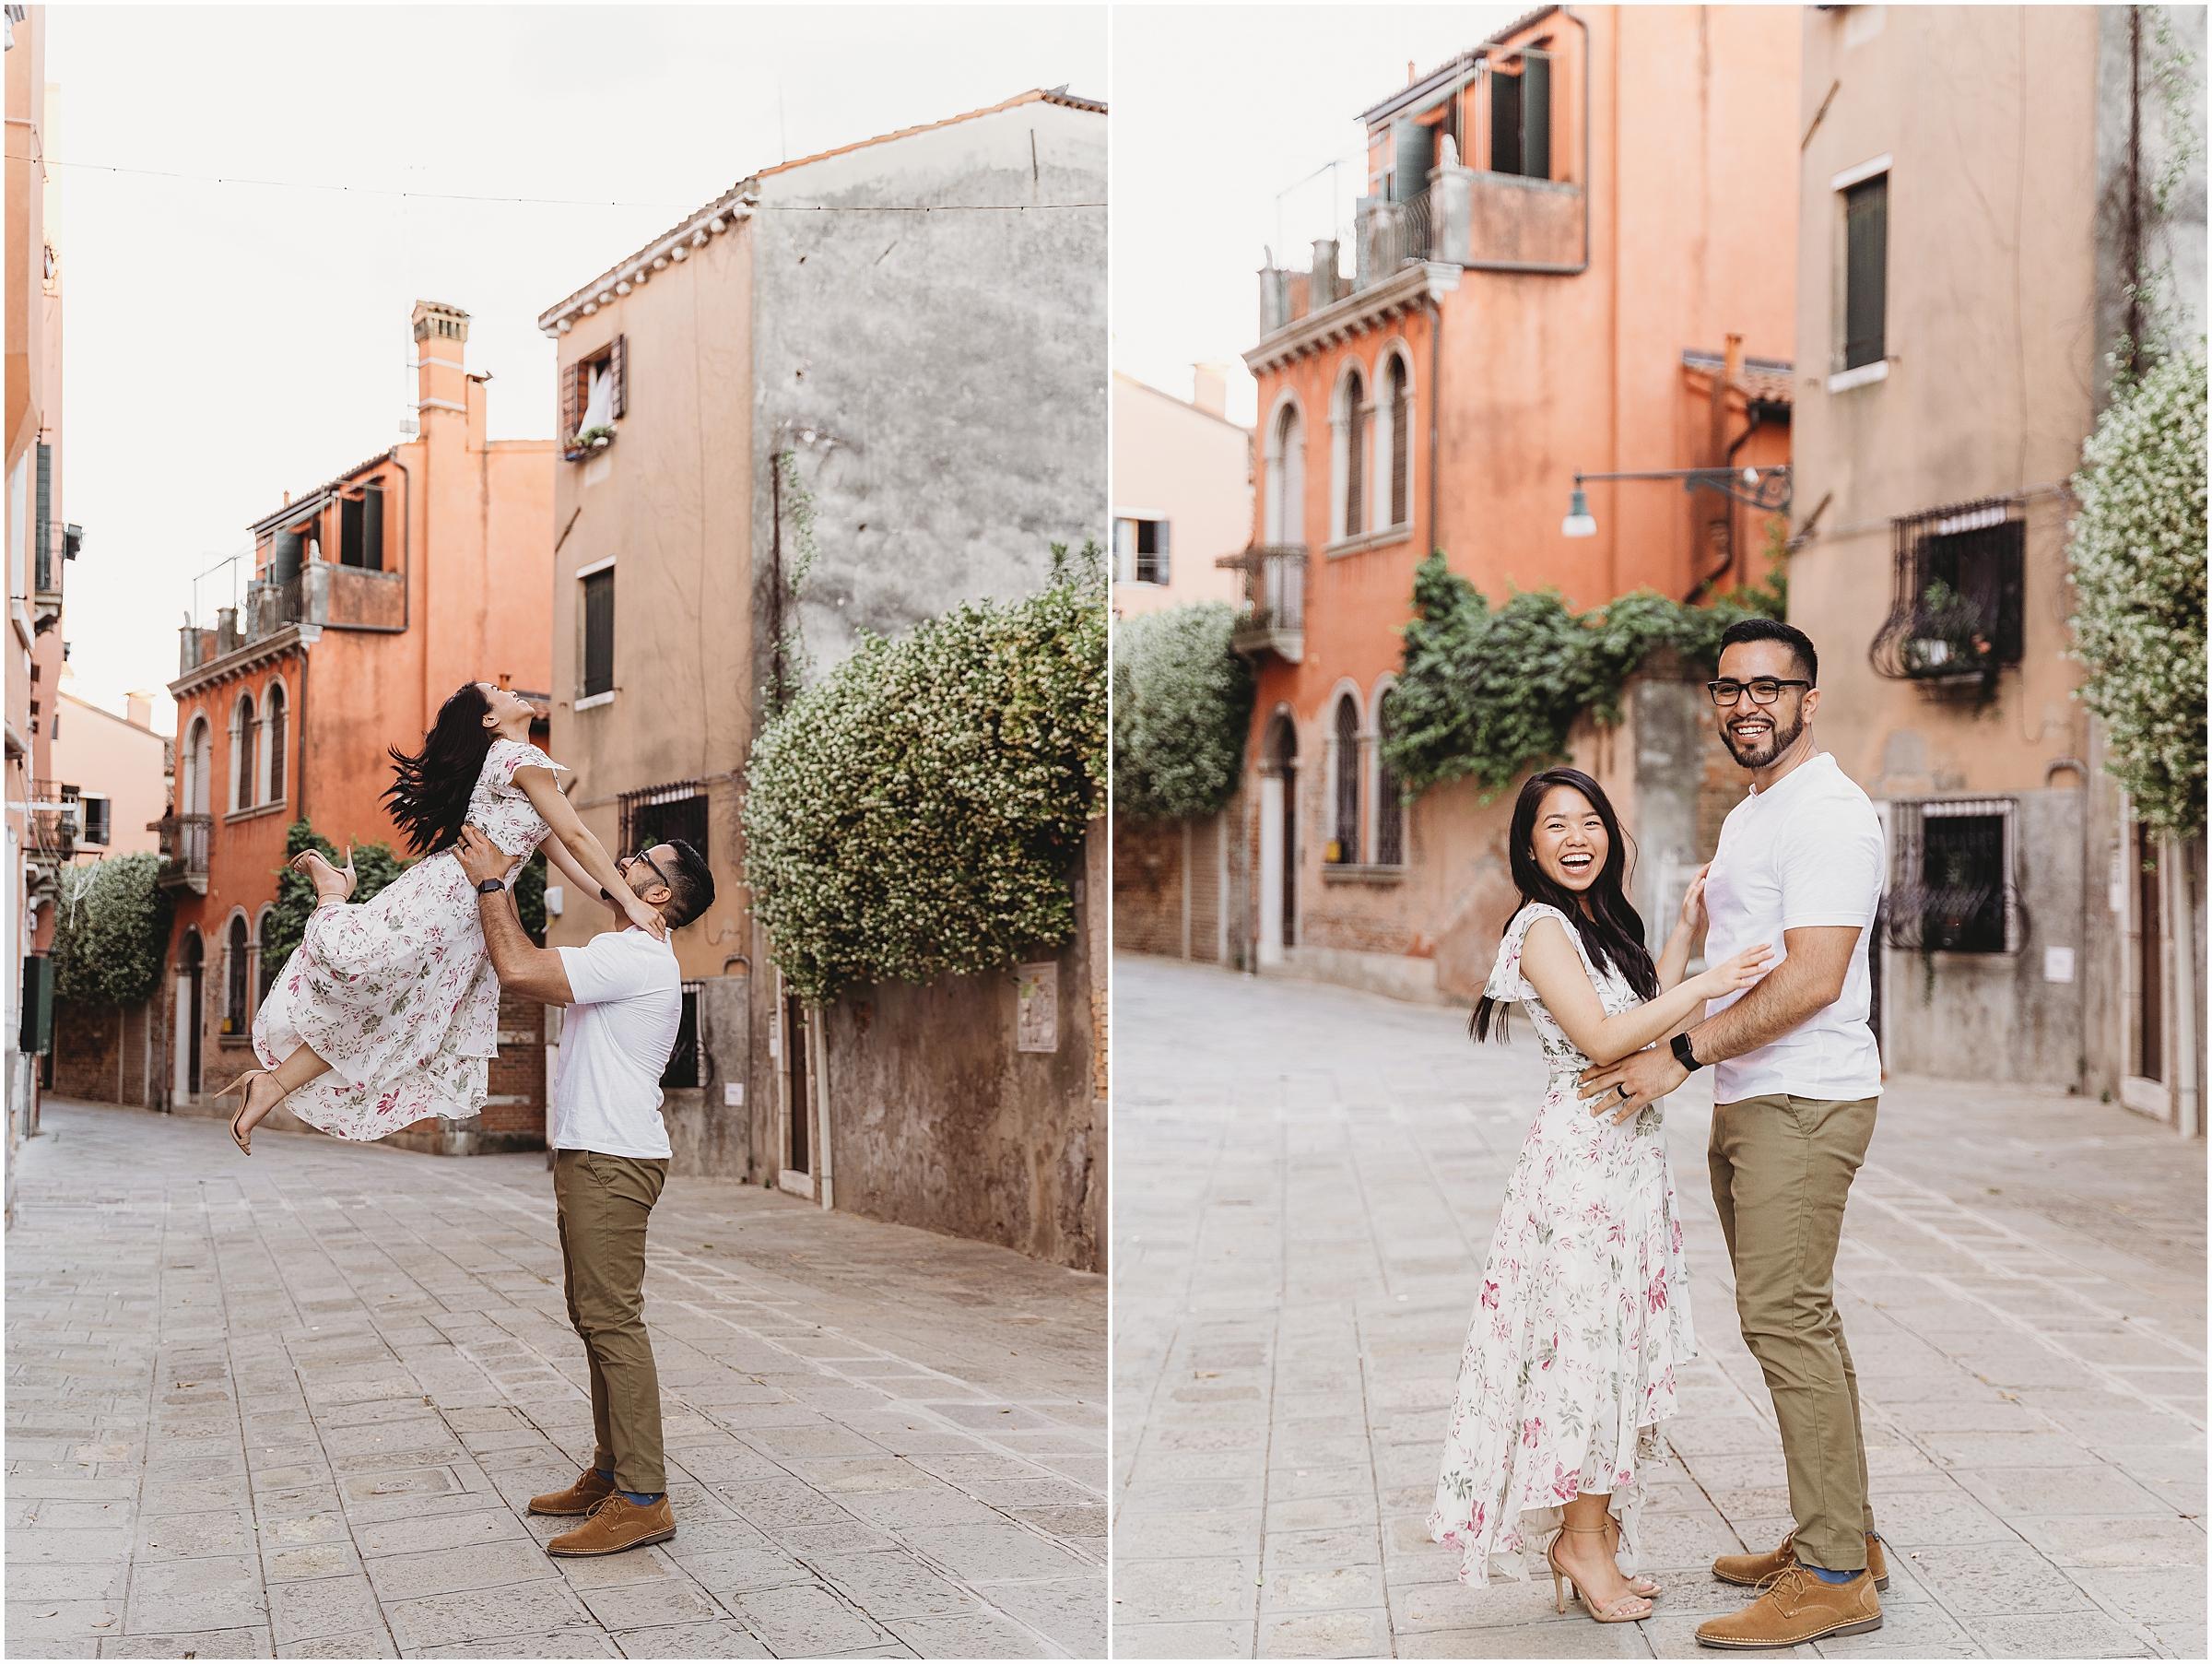 photographer-in-venice-elopement-shooting-Venice-couple_08.jpg